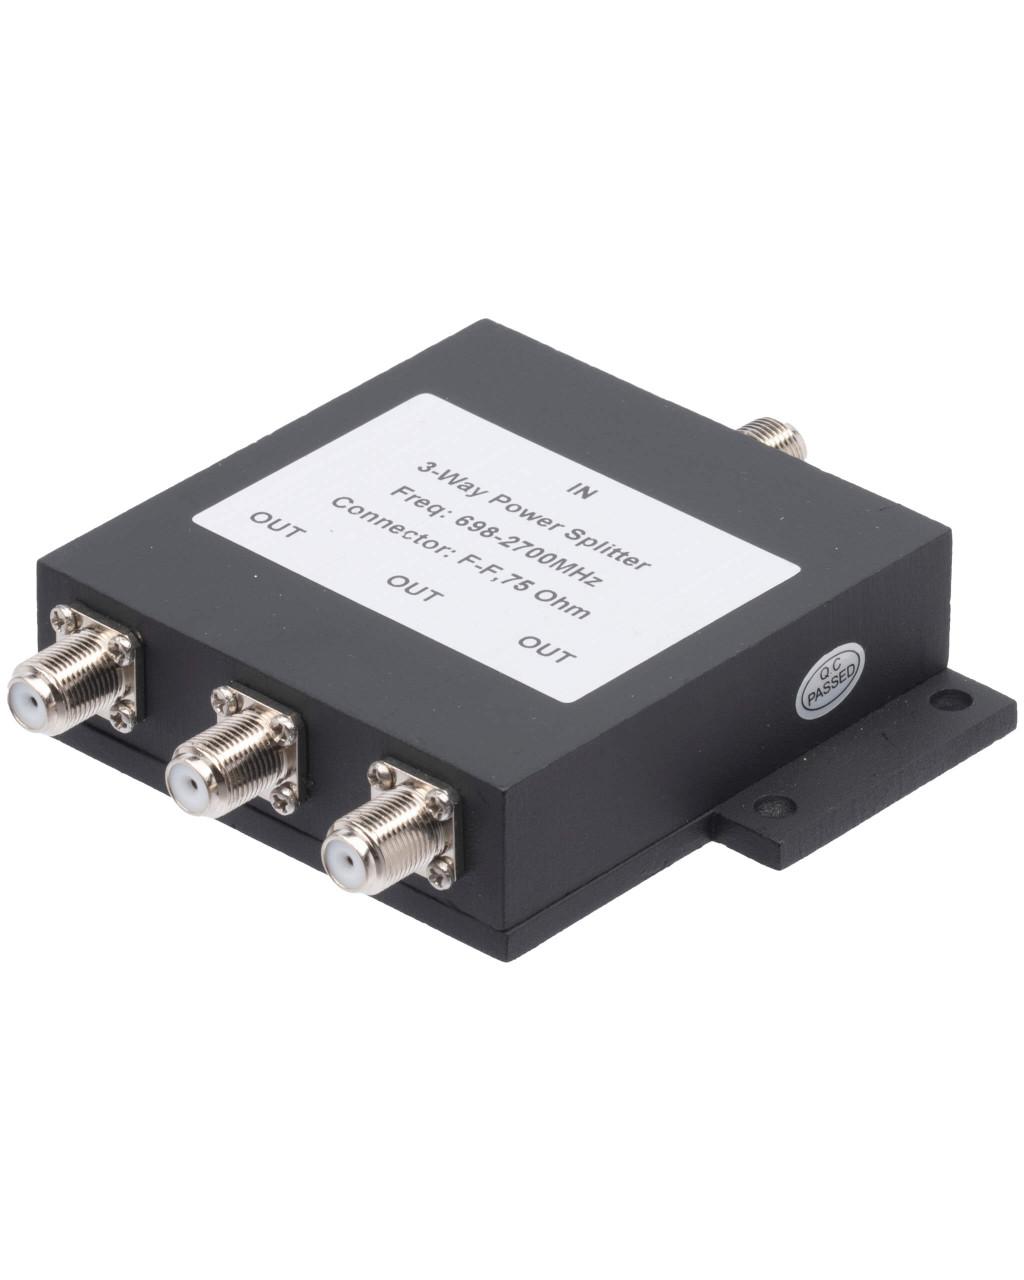 3-Way Splitter for 689-2700 MHz Wilkinson Style 75 Ohm